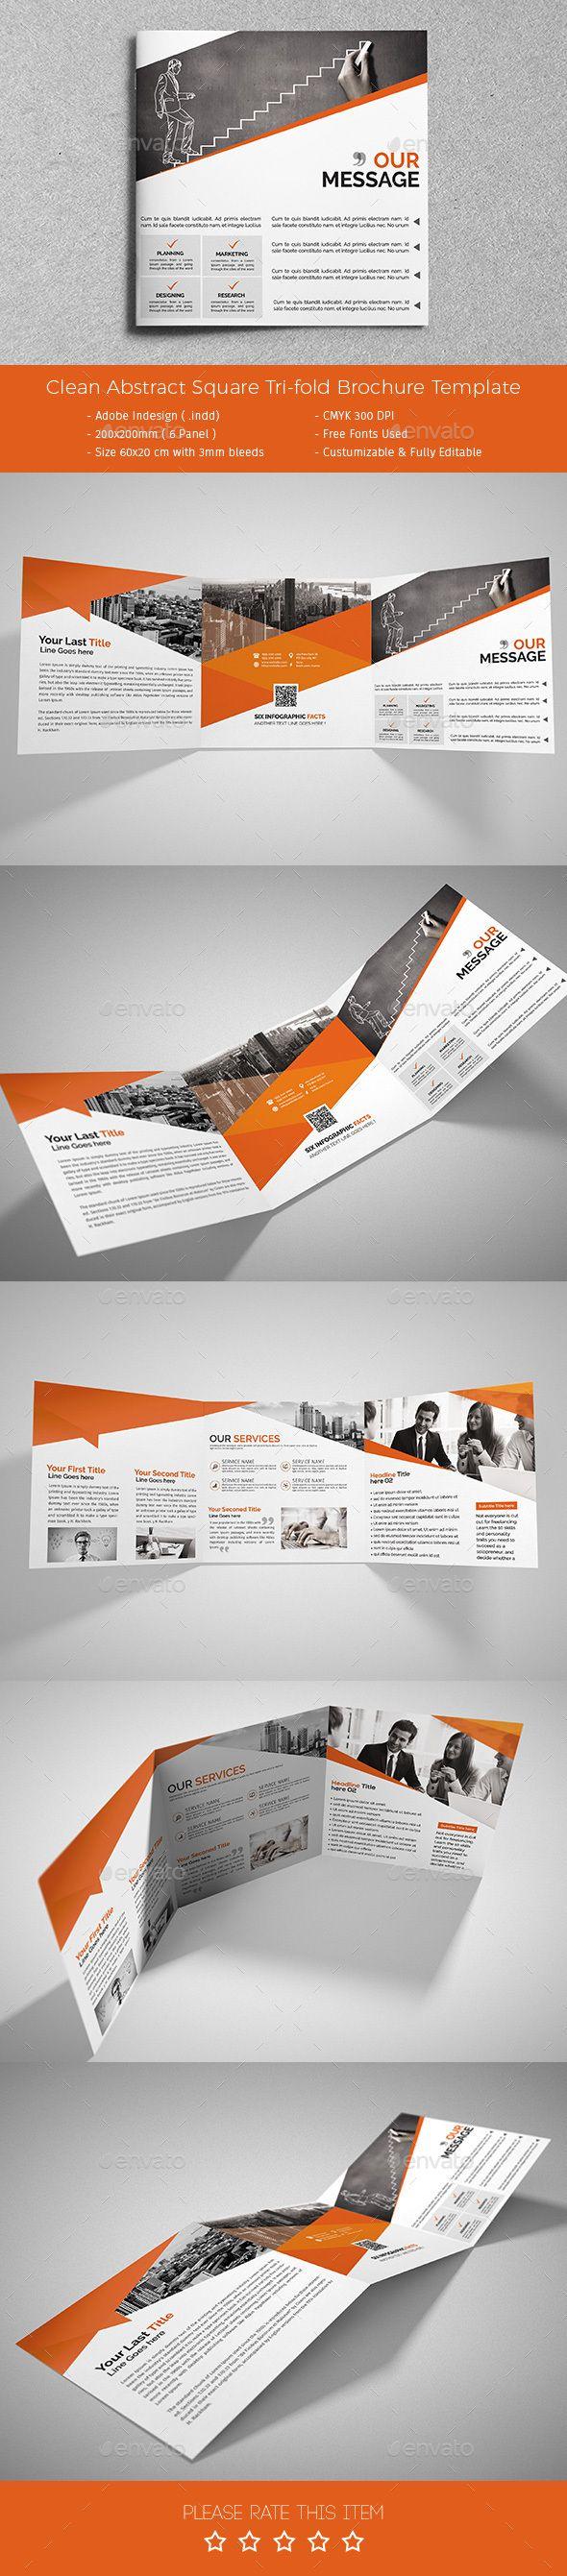 Corporate Tri-fold Square Brochure Template PSD #design Download: http://graphicriver.net/item/corporate-trifold-square-brochure-02/13604195?ref=ksioks